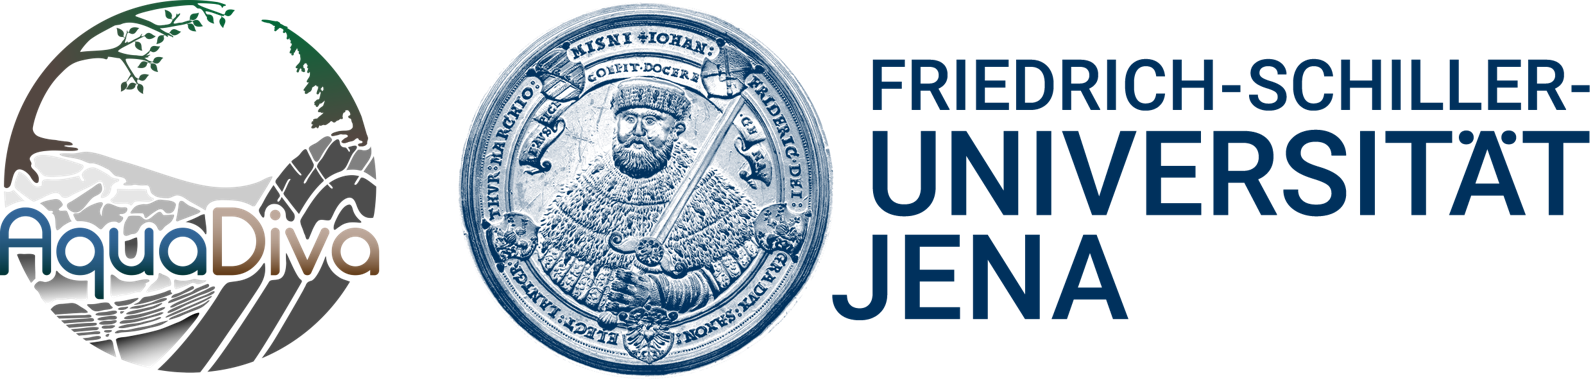 Postdoctoral Researcher in Cheminformatics/Bioinformatics - Friedrich Schiller University Jena - Logo